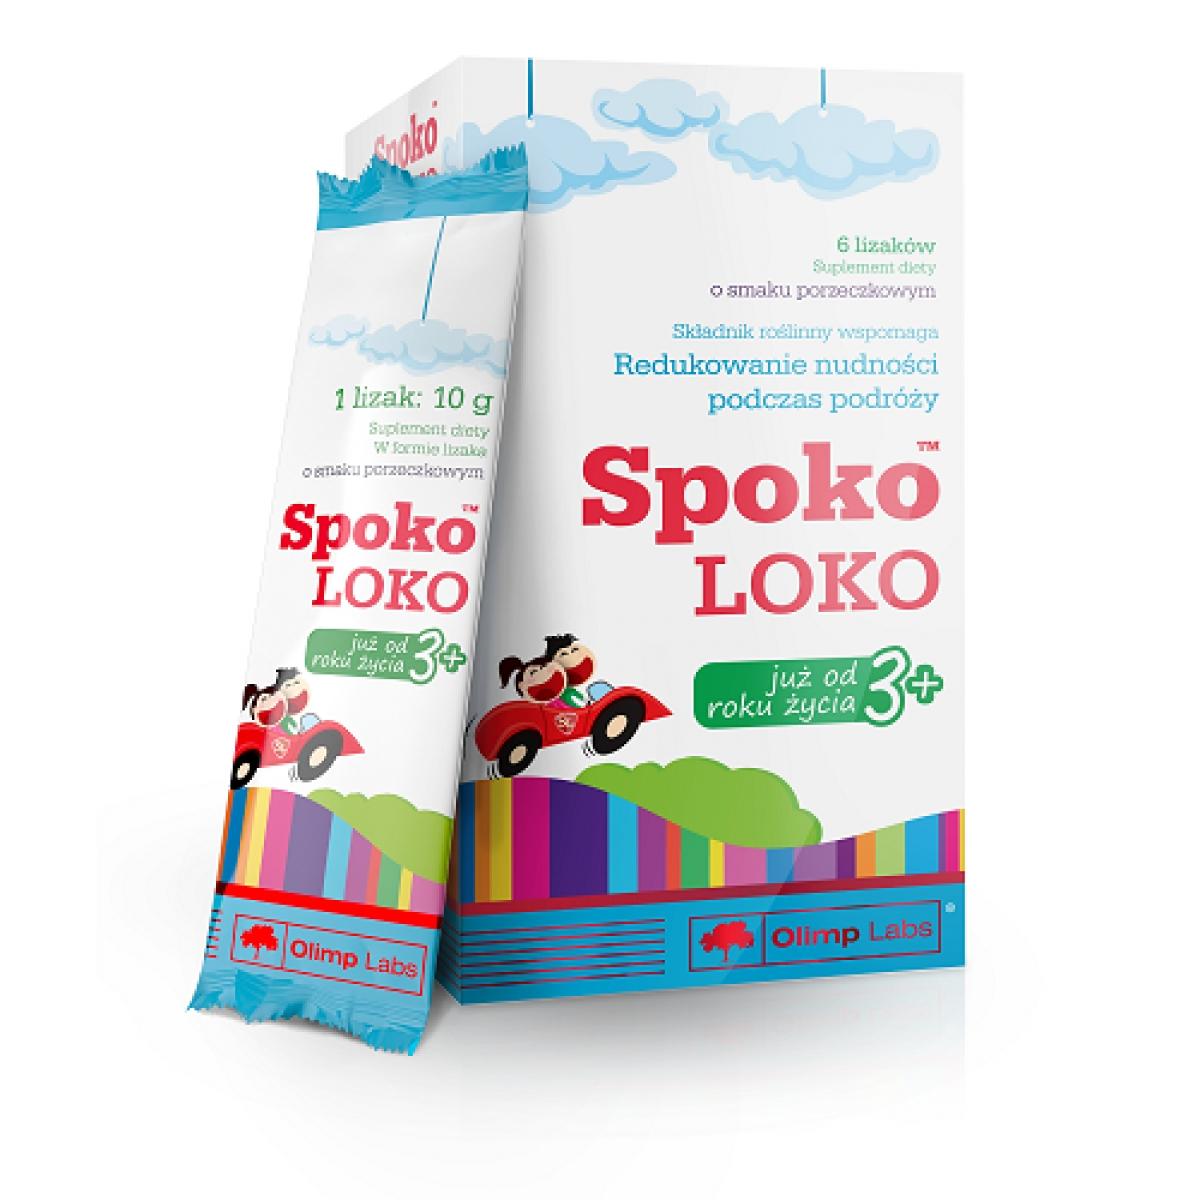 SPOKO LOKO, 6 ЛЕДЕНЦОВ